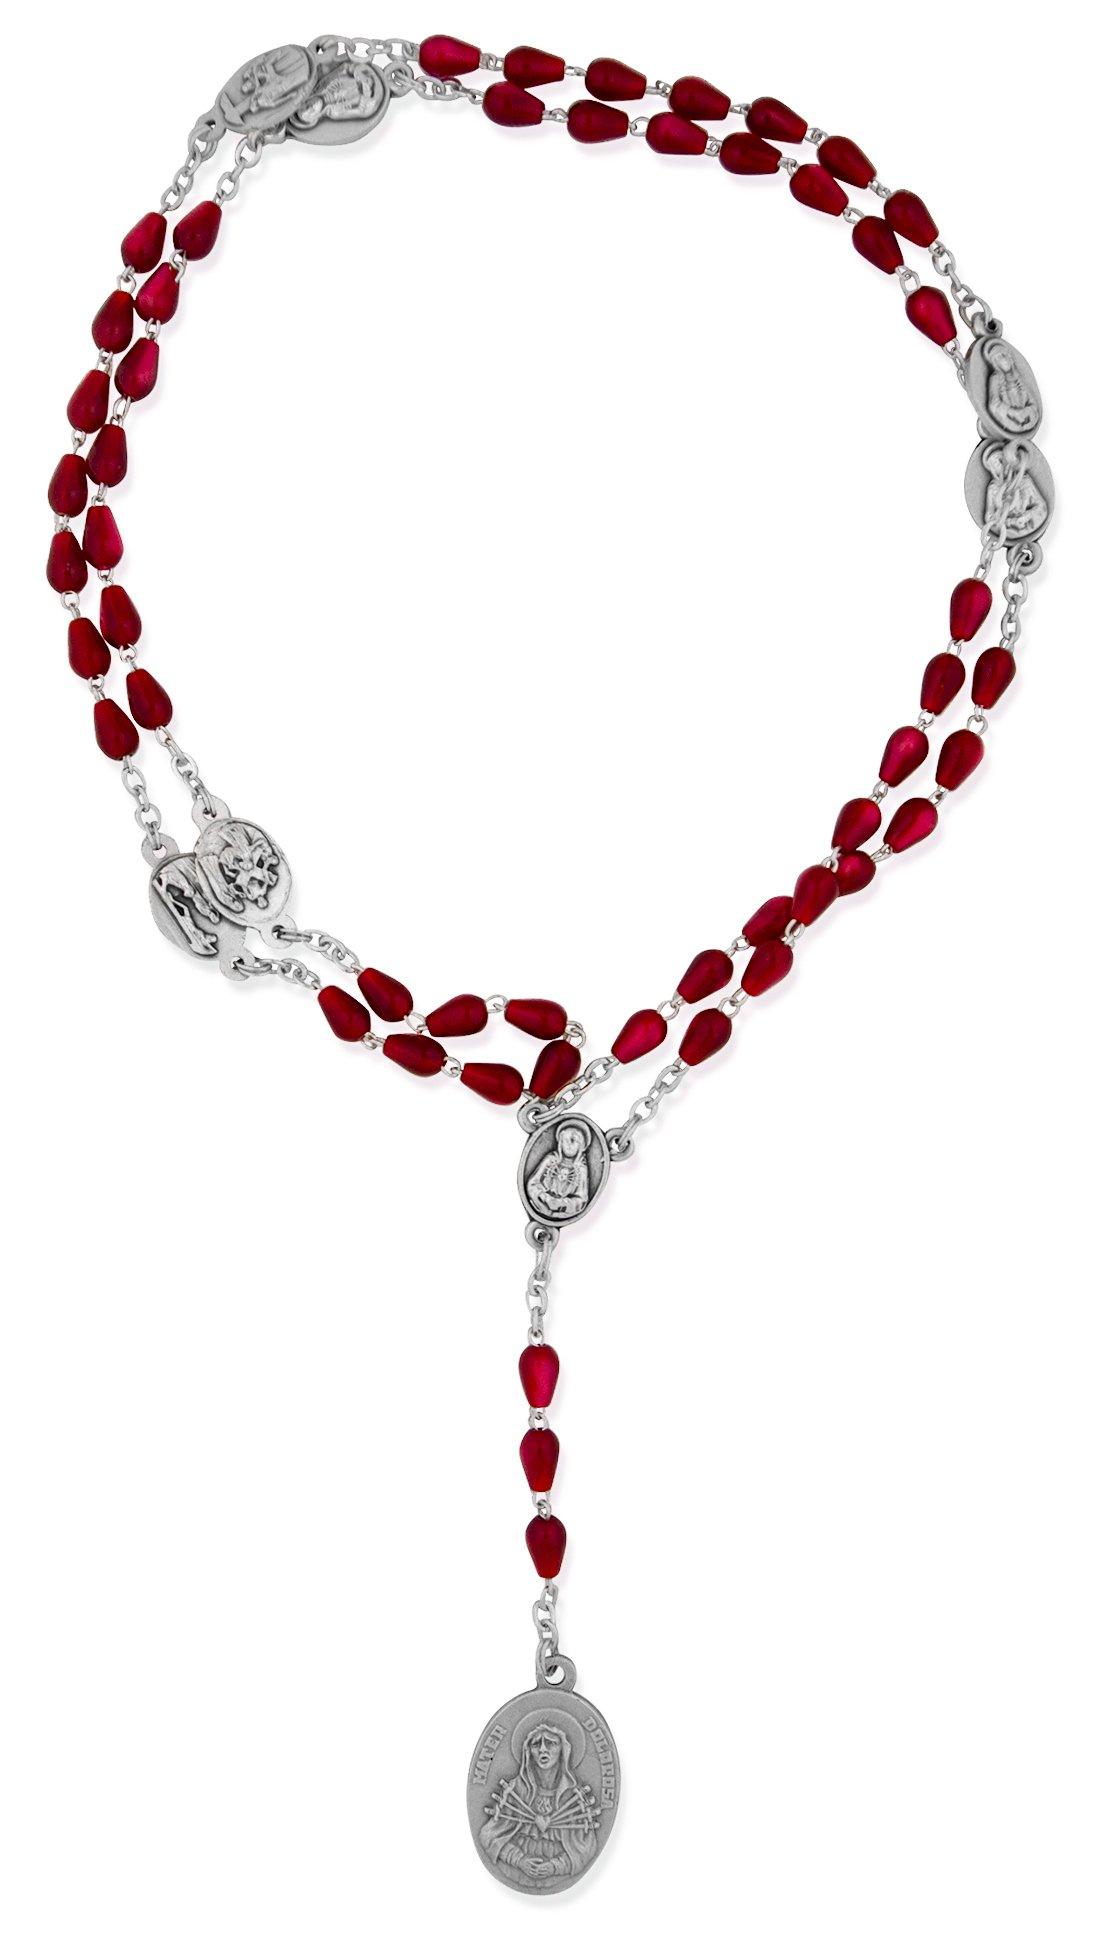 Venerare Traditional Catholic Seven Sorrows Rosary (Red Teardrop)